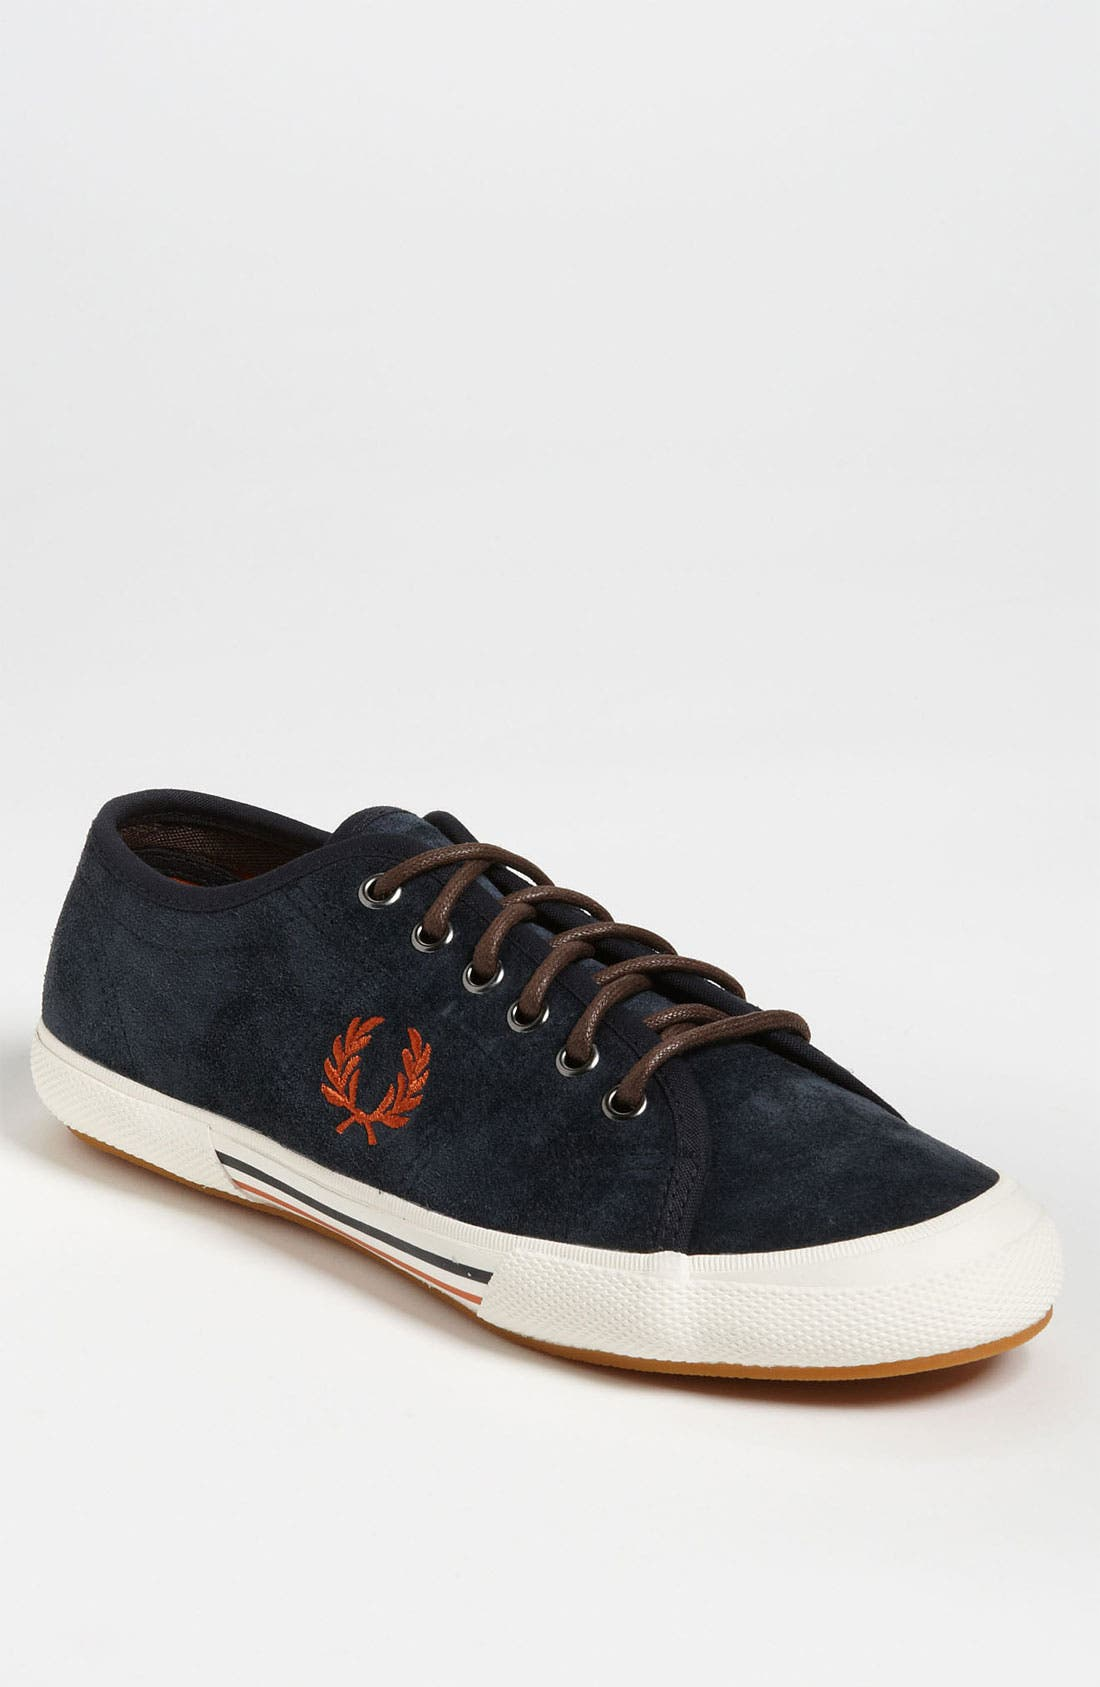 Alternate Image 1 Selected - Fred Perry Vintage Suede Tennis Sneaker